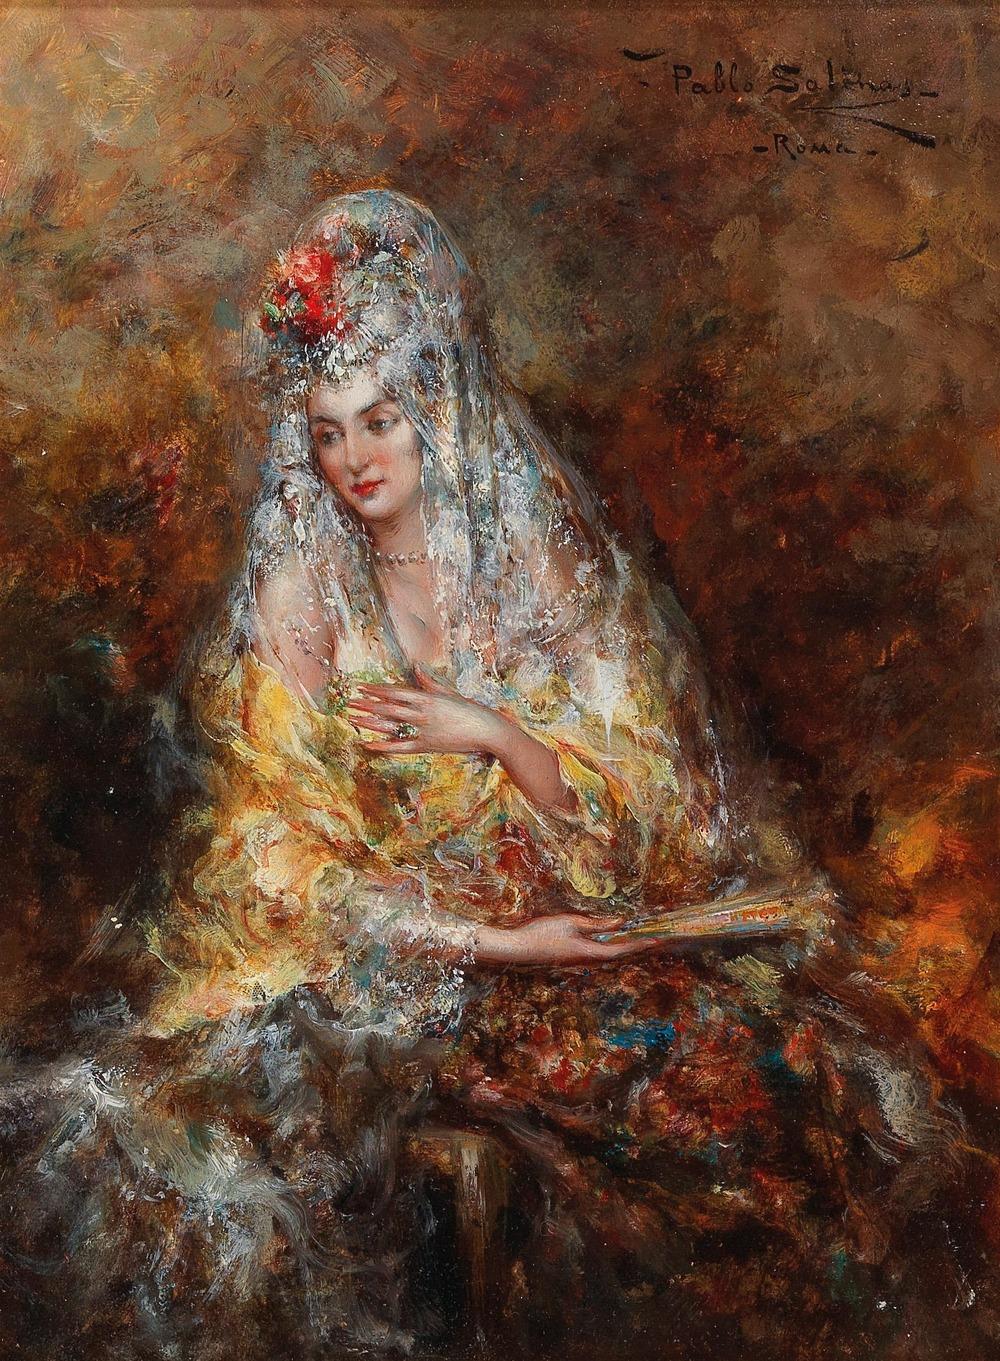 Pablo Salinas y Teruel *(Madrid 1871–1946 Rome) Spanish beauty